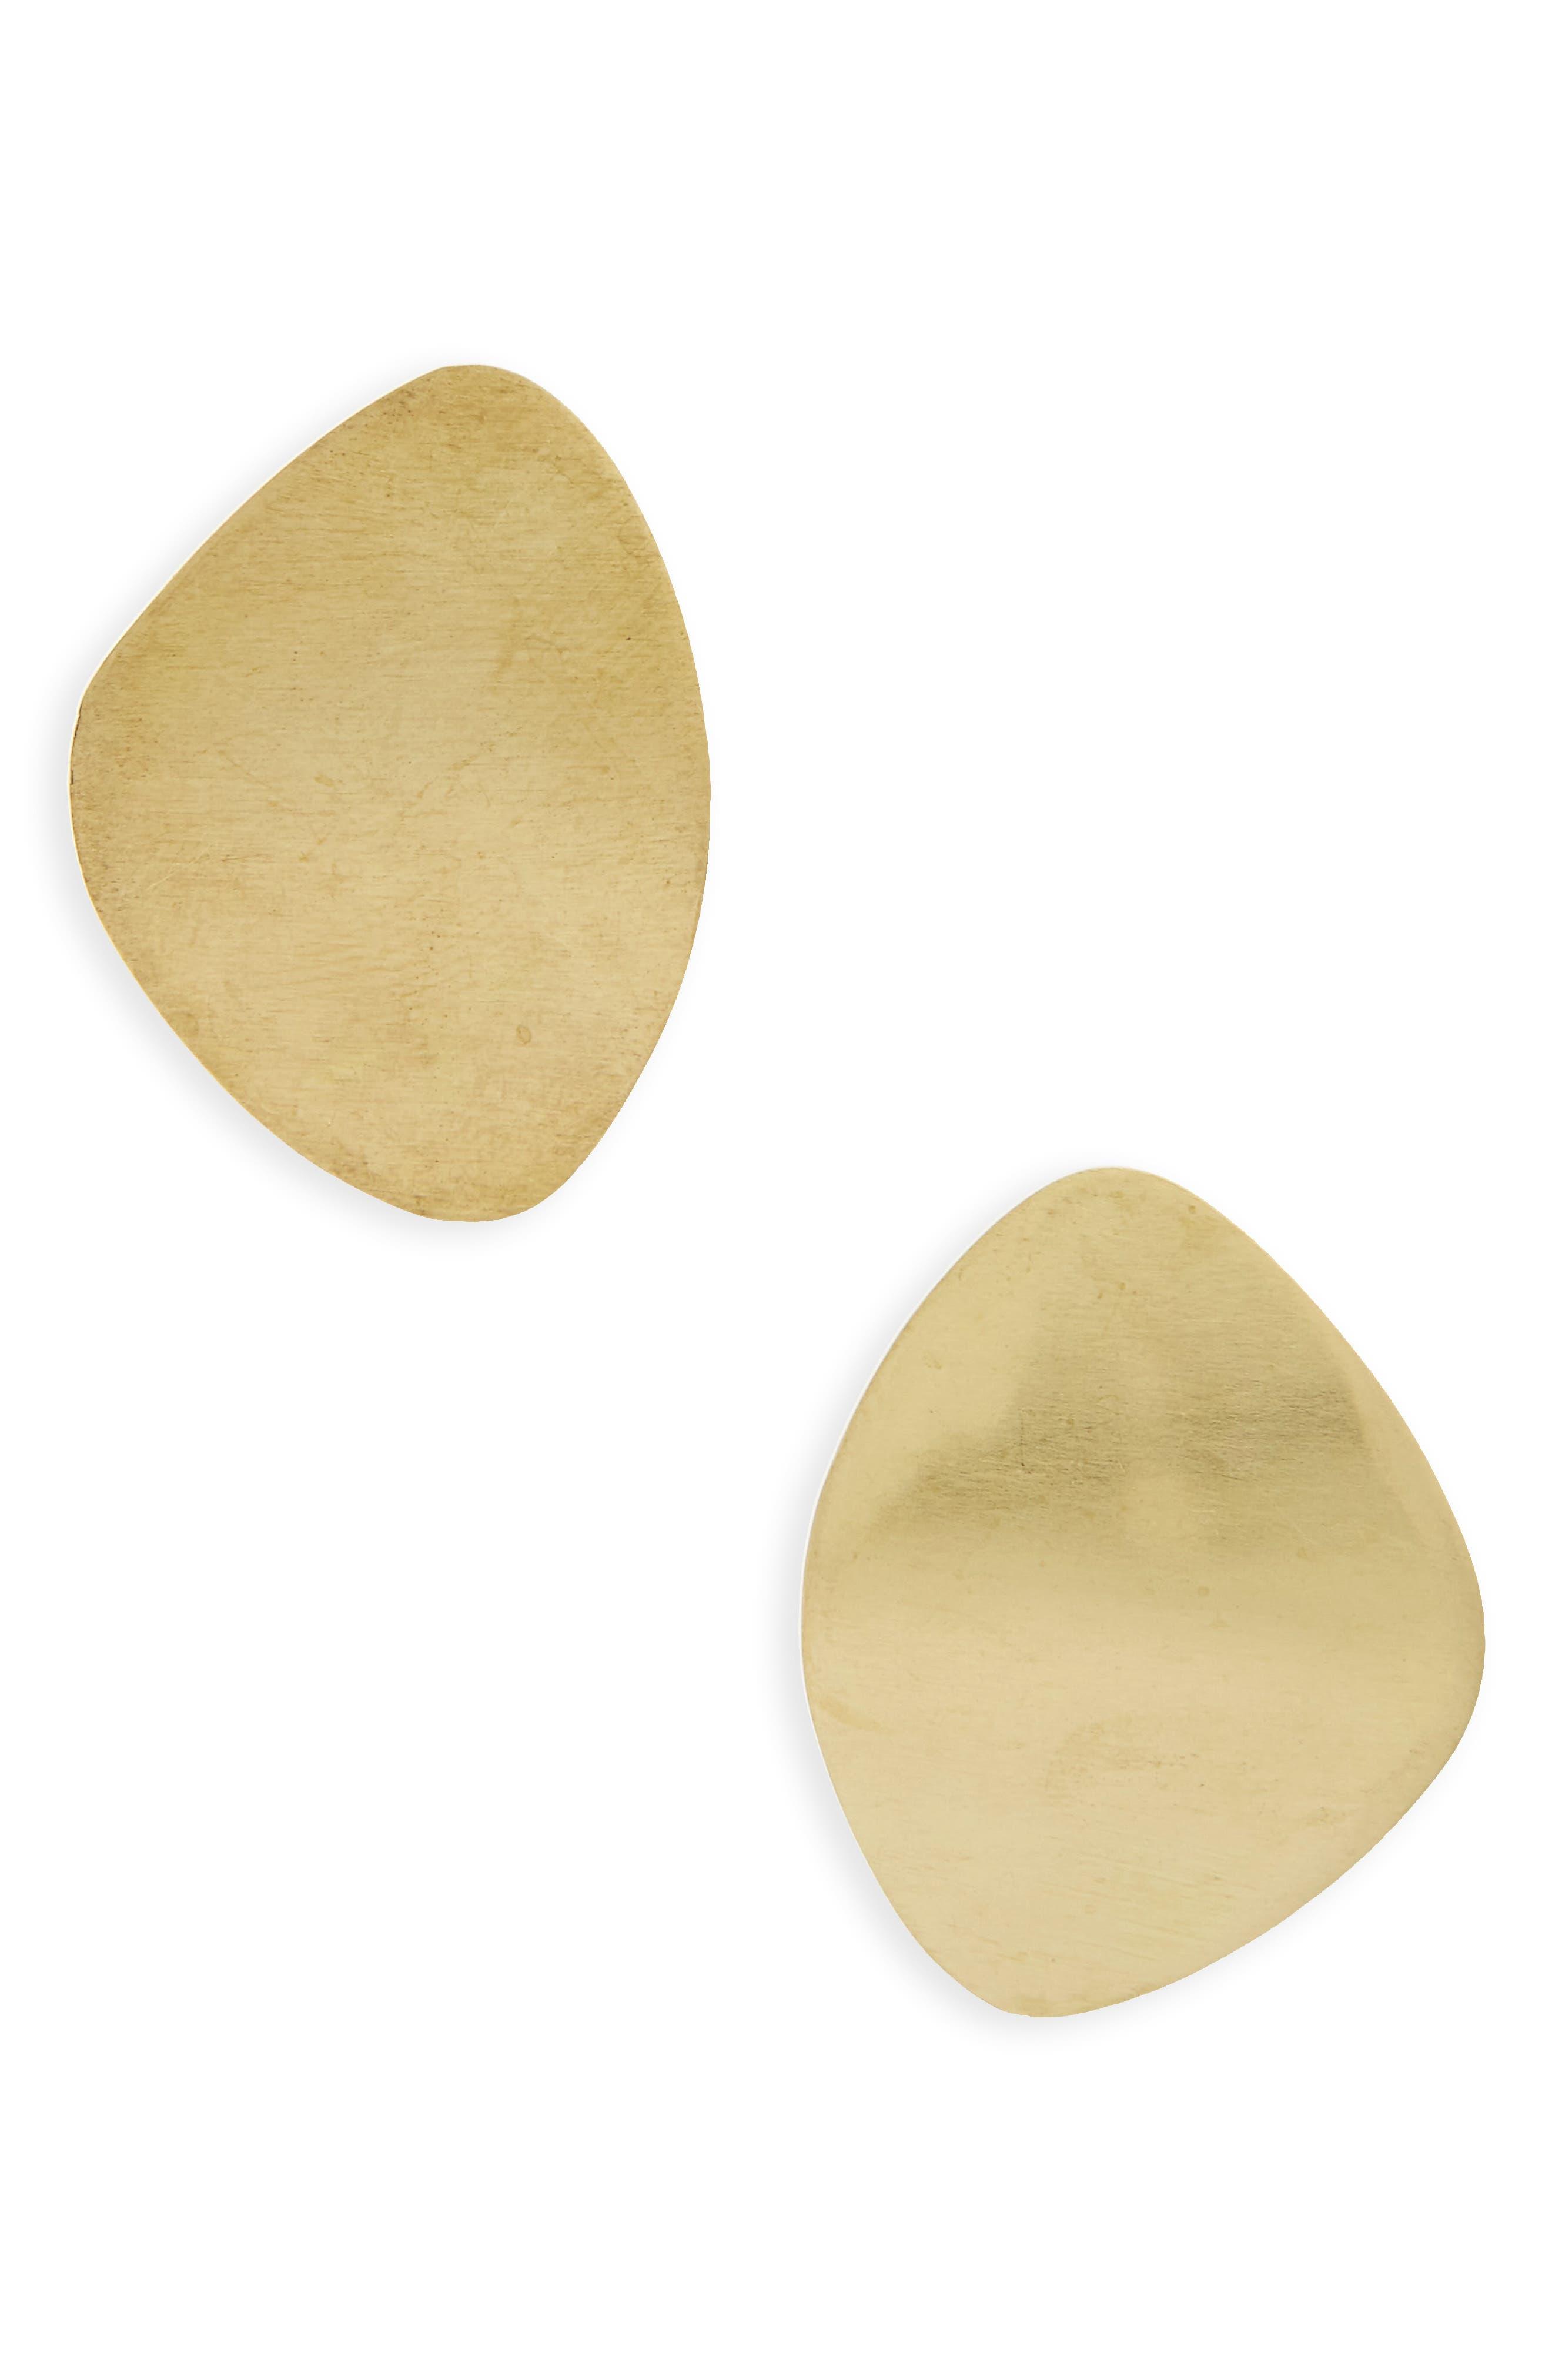 Soko Sabi Large Stud Earrings